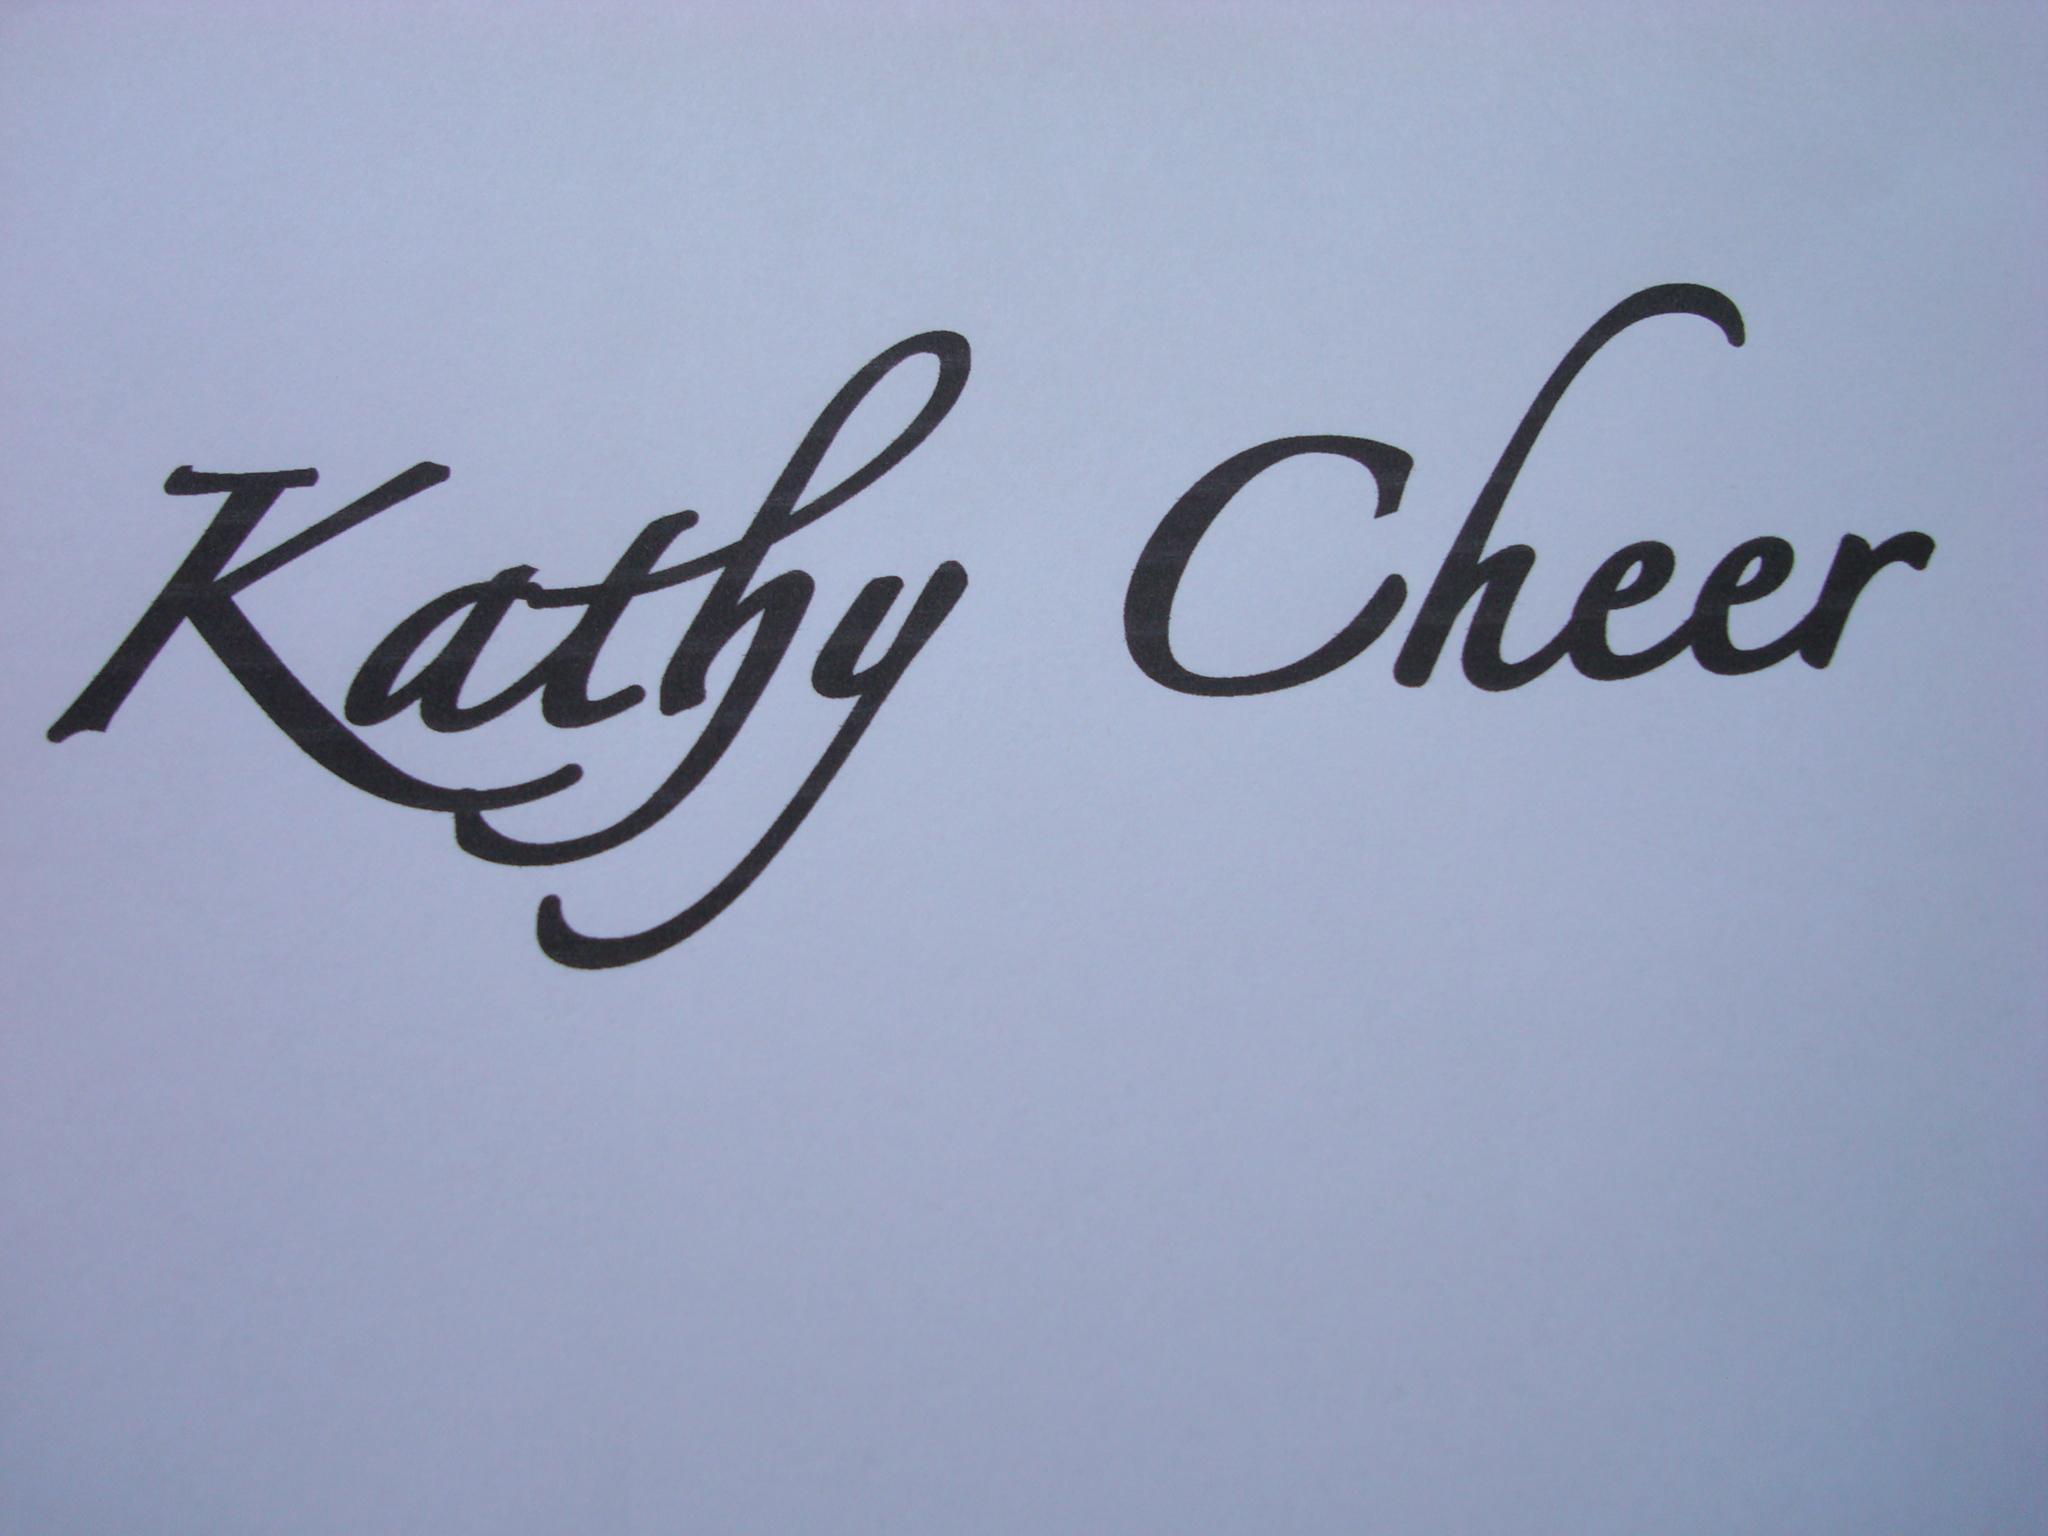 kathy cheer's Signature